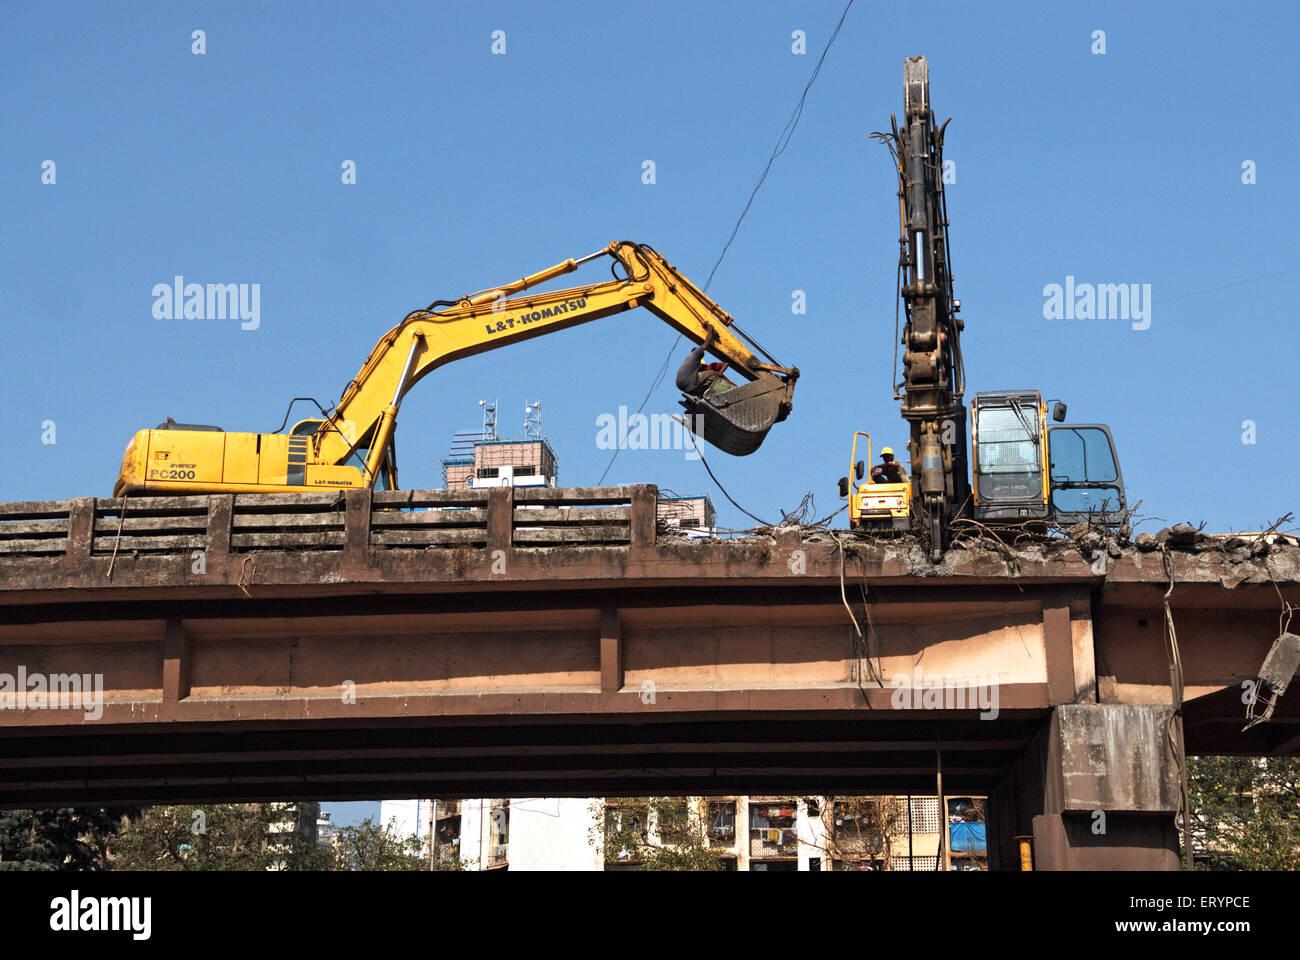 Demolishing lalbaug flyover using heavy machinery in Bombay Mumbai  ; Maharashtra  ; India 5 May 2009 - Stock Image